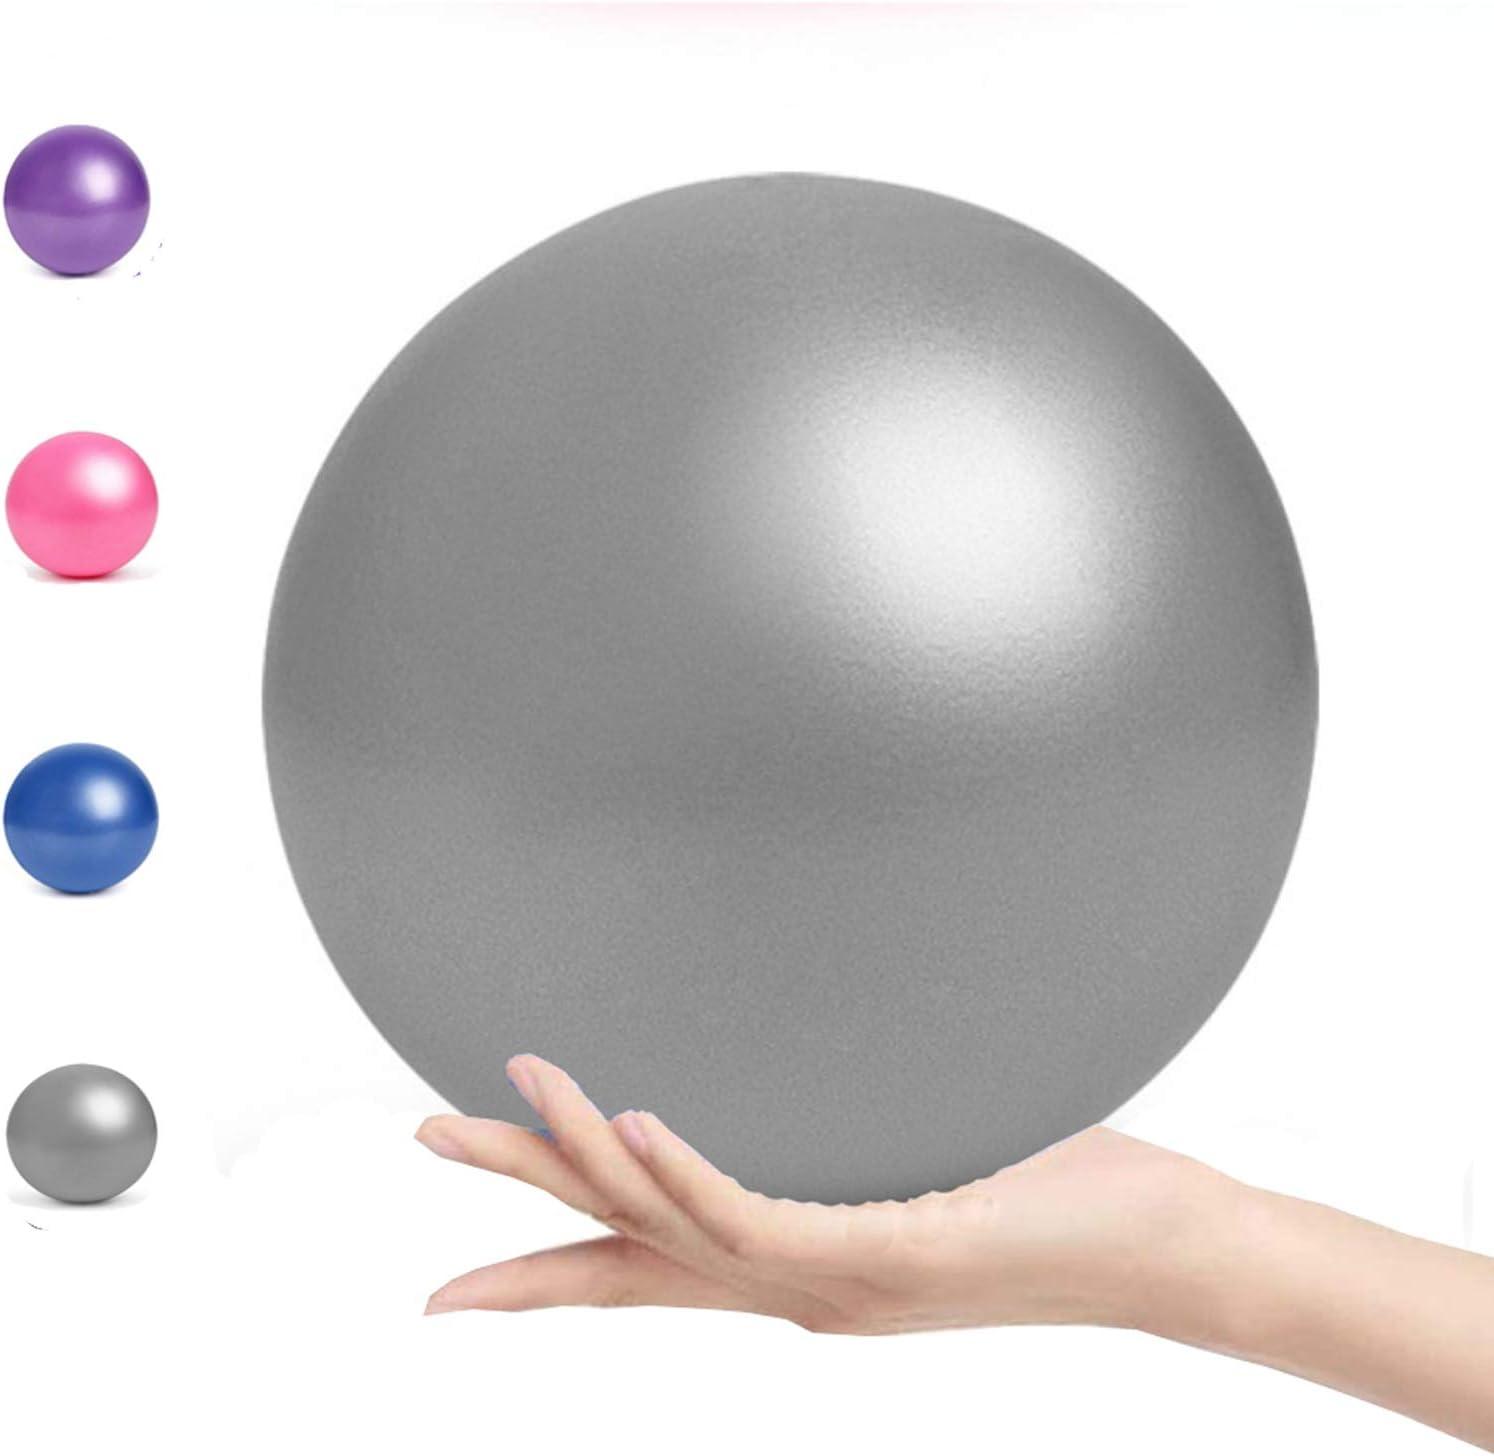 AILIFE Popular brand in the world Exercise Ball Anti-Burst Yoga Austin Mall Fitness Anti-Slip and